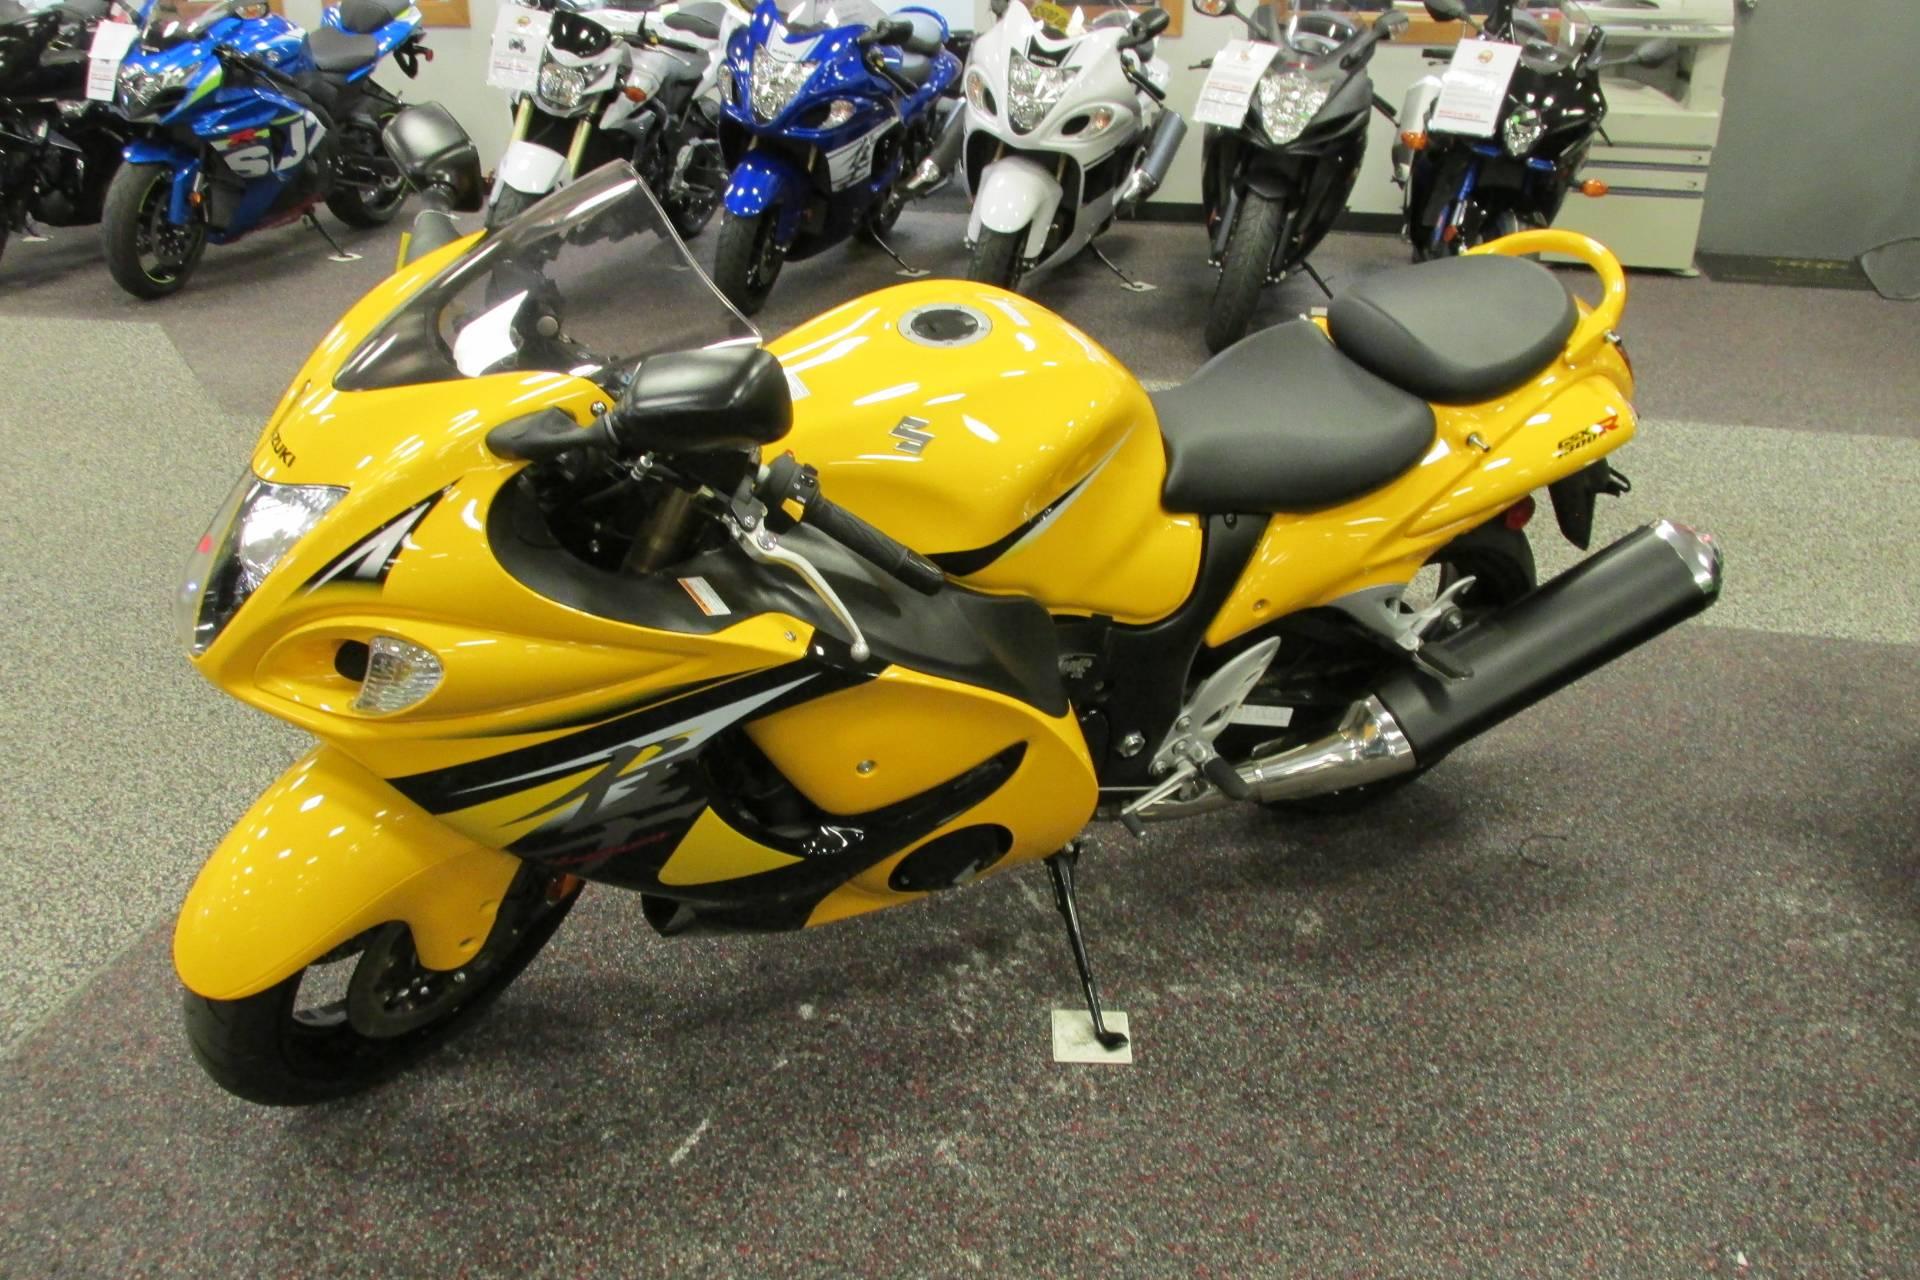 2013 Suzuki HAYABUSA 4